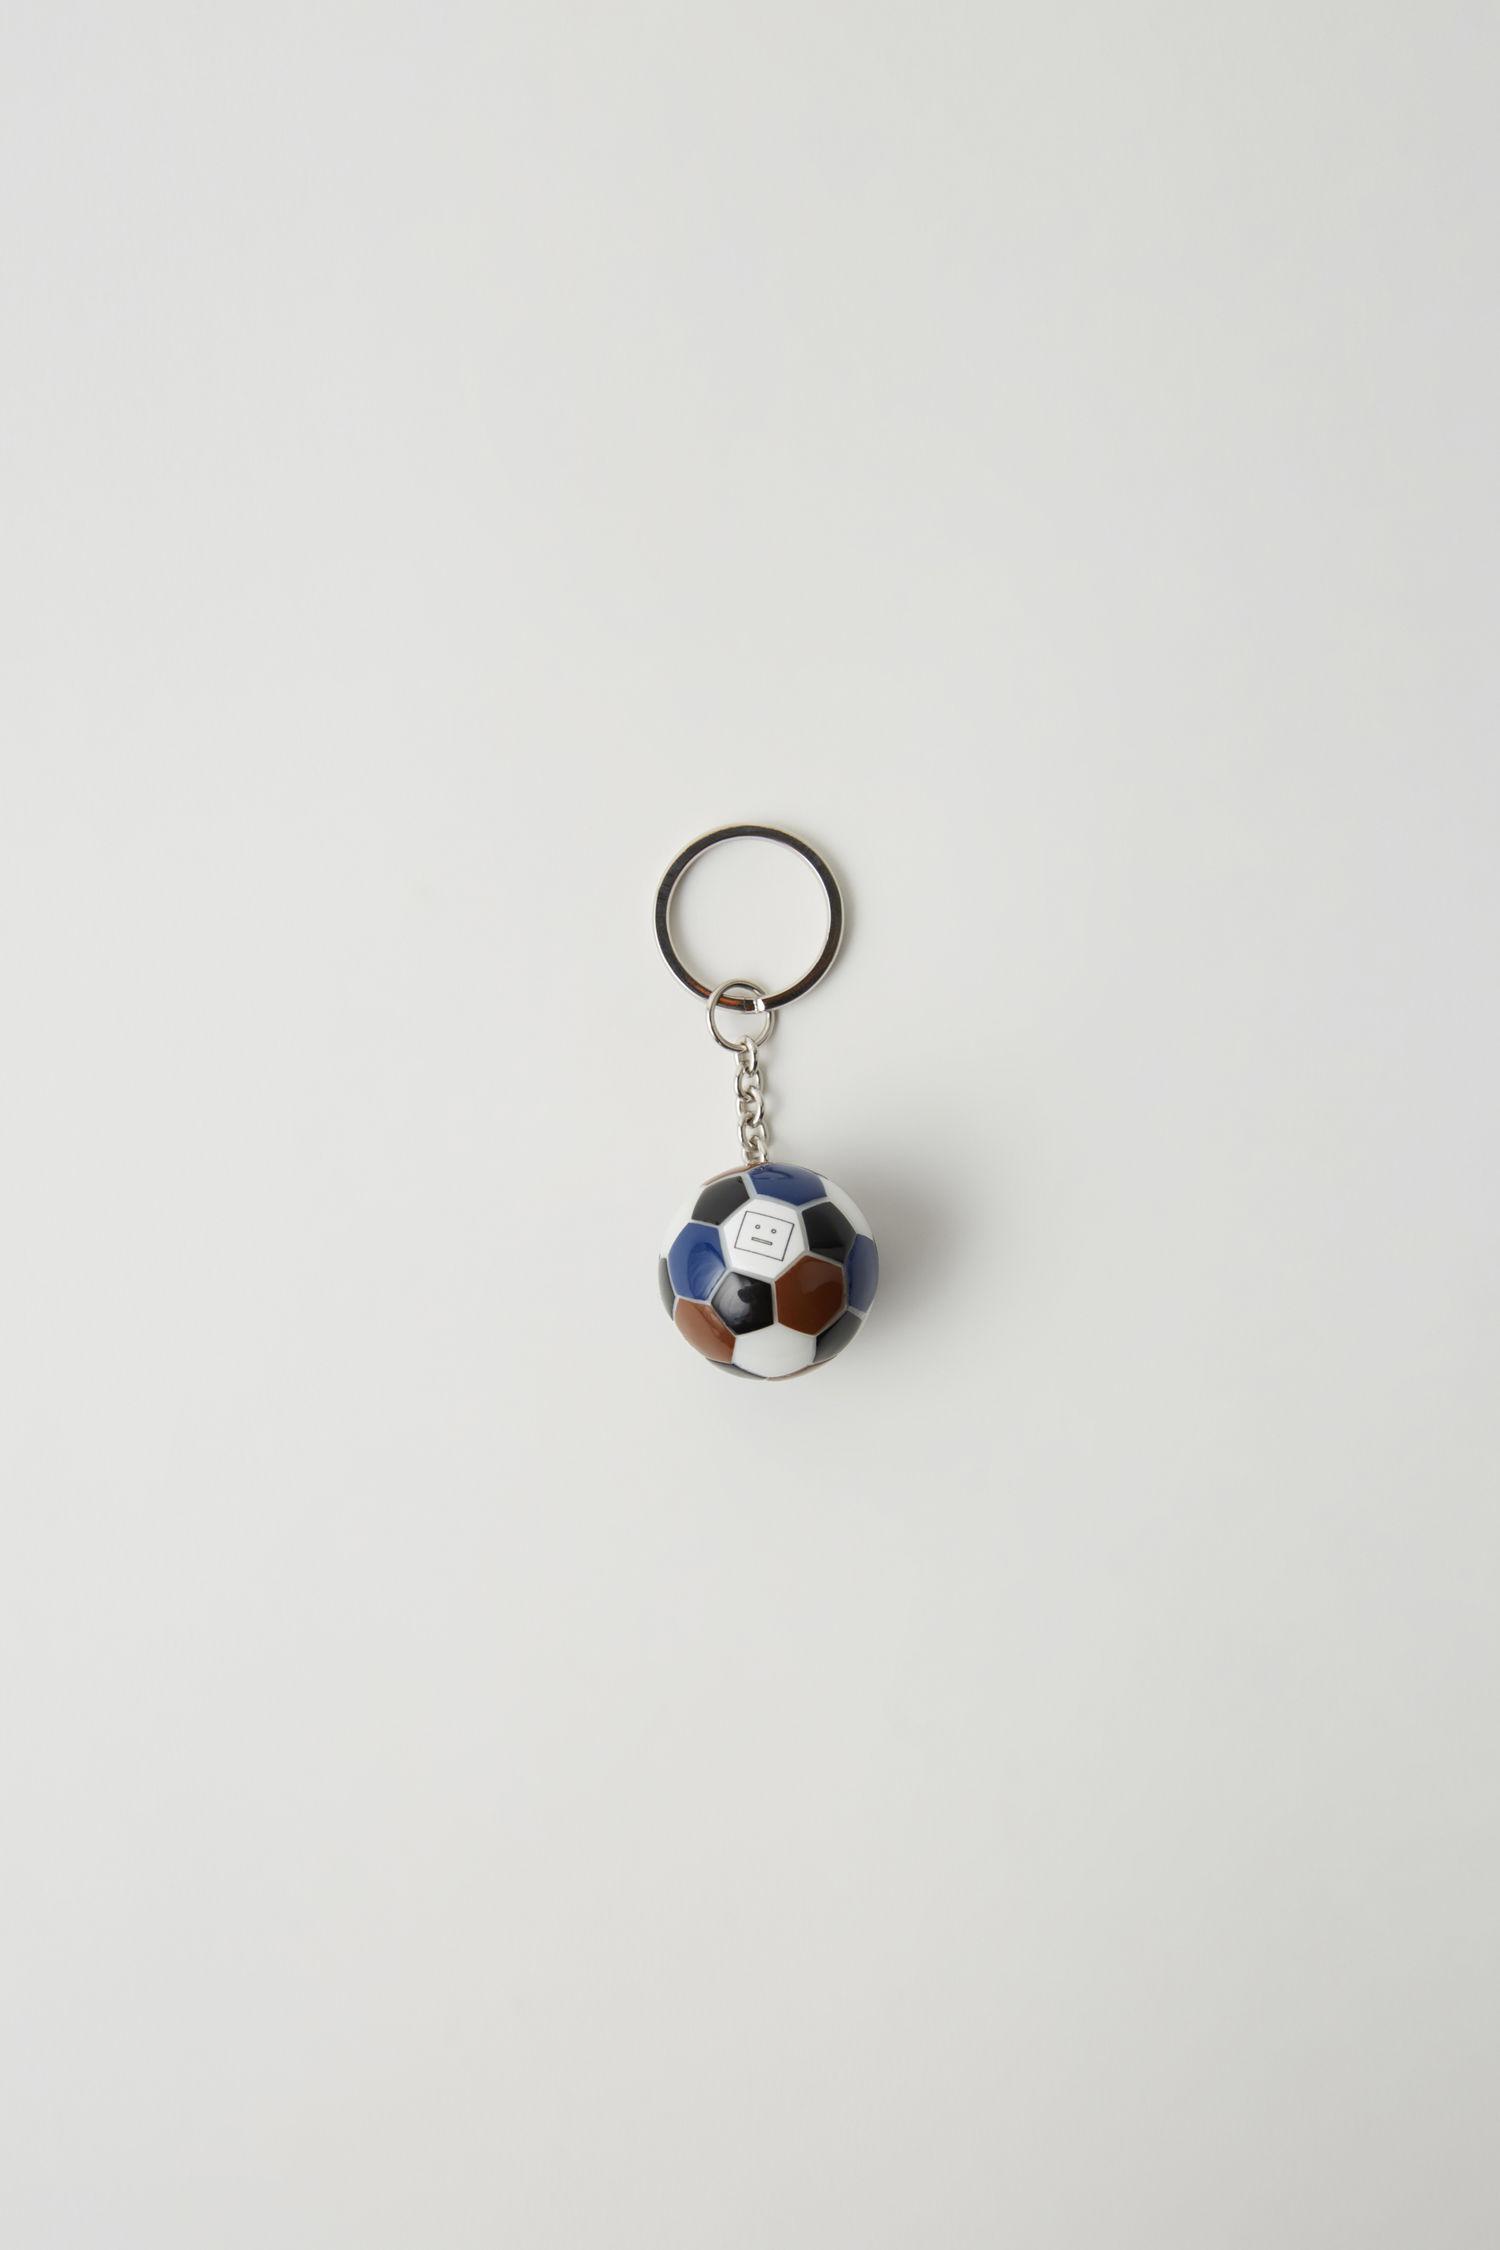 8a38de9caf8 Lyst - Acne Studios Football Keychain brown blue in Brown